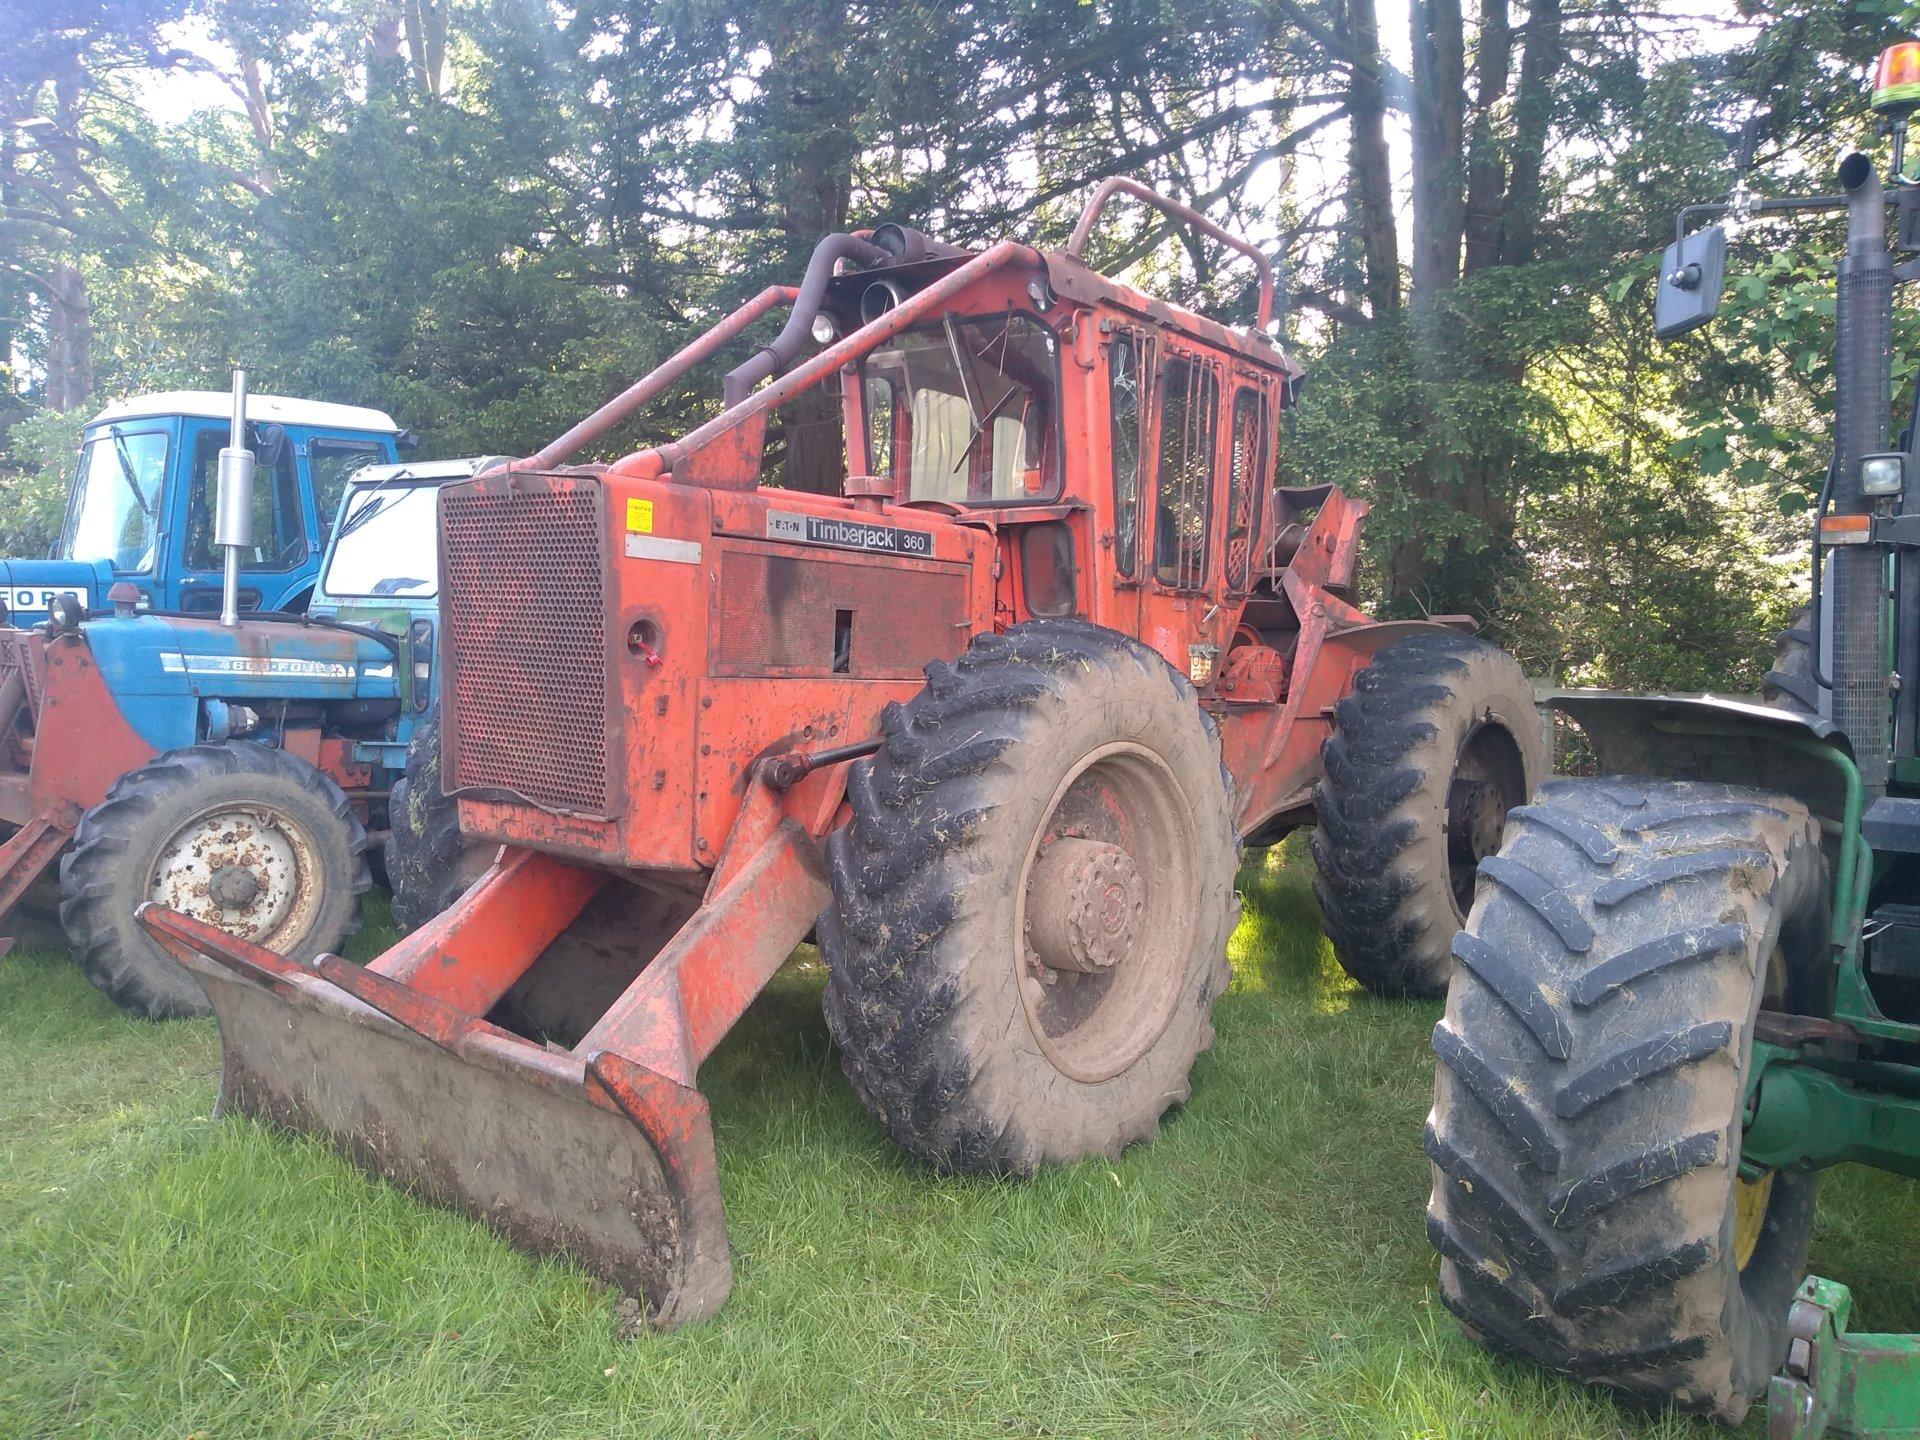 TractorFest 2019 | The Farming Forum